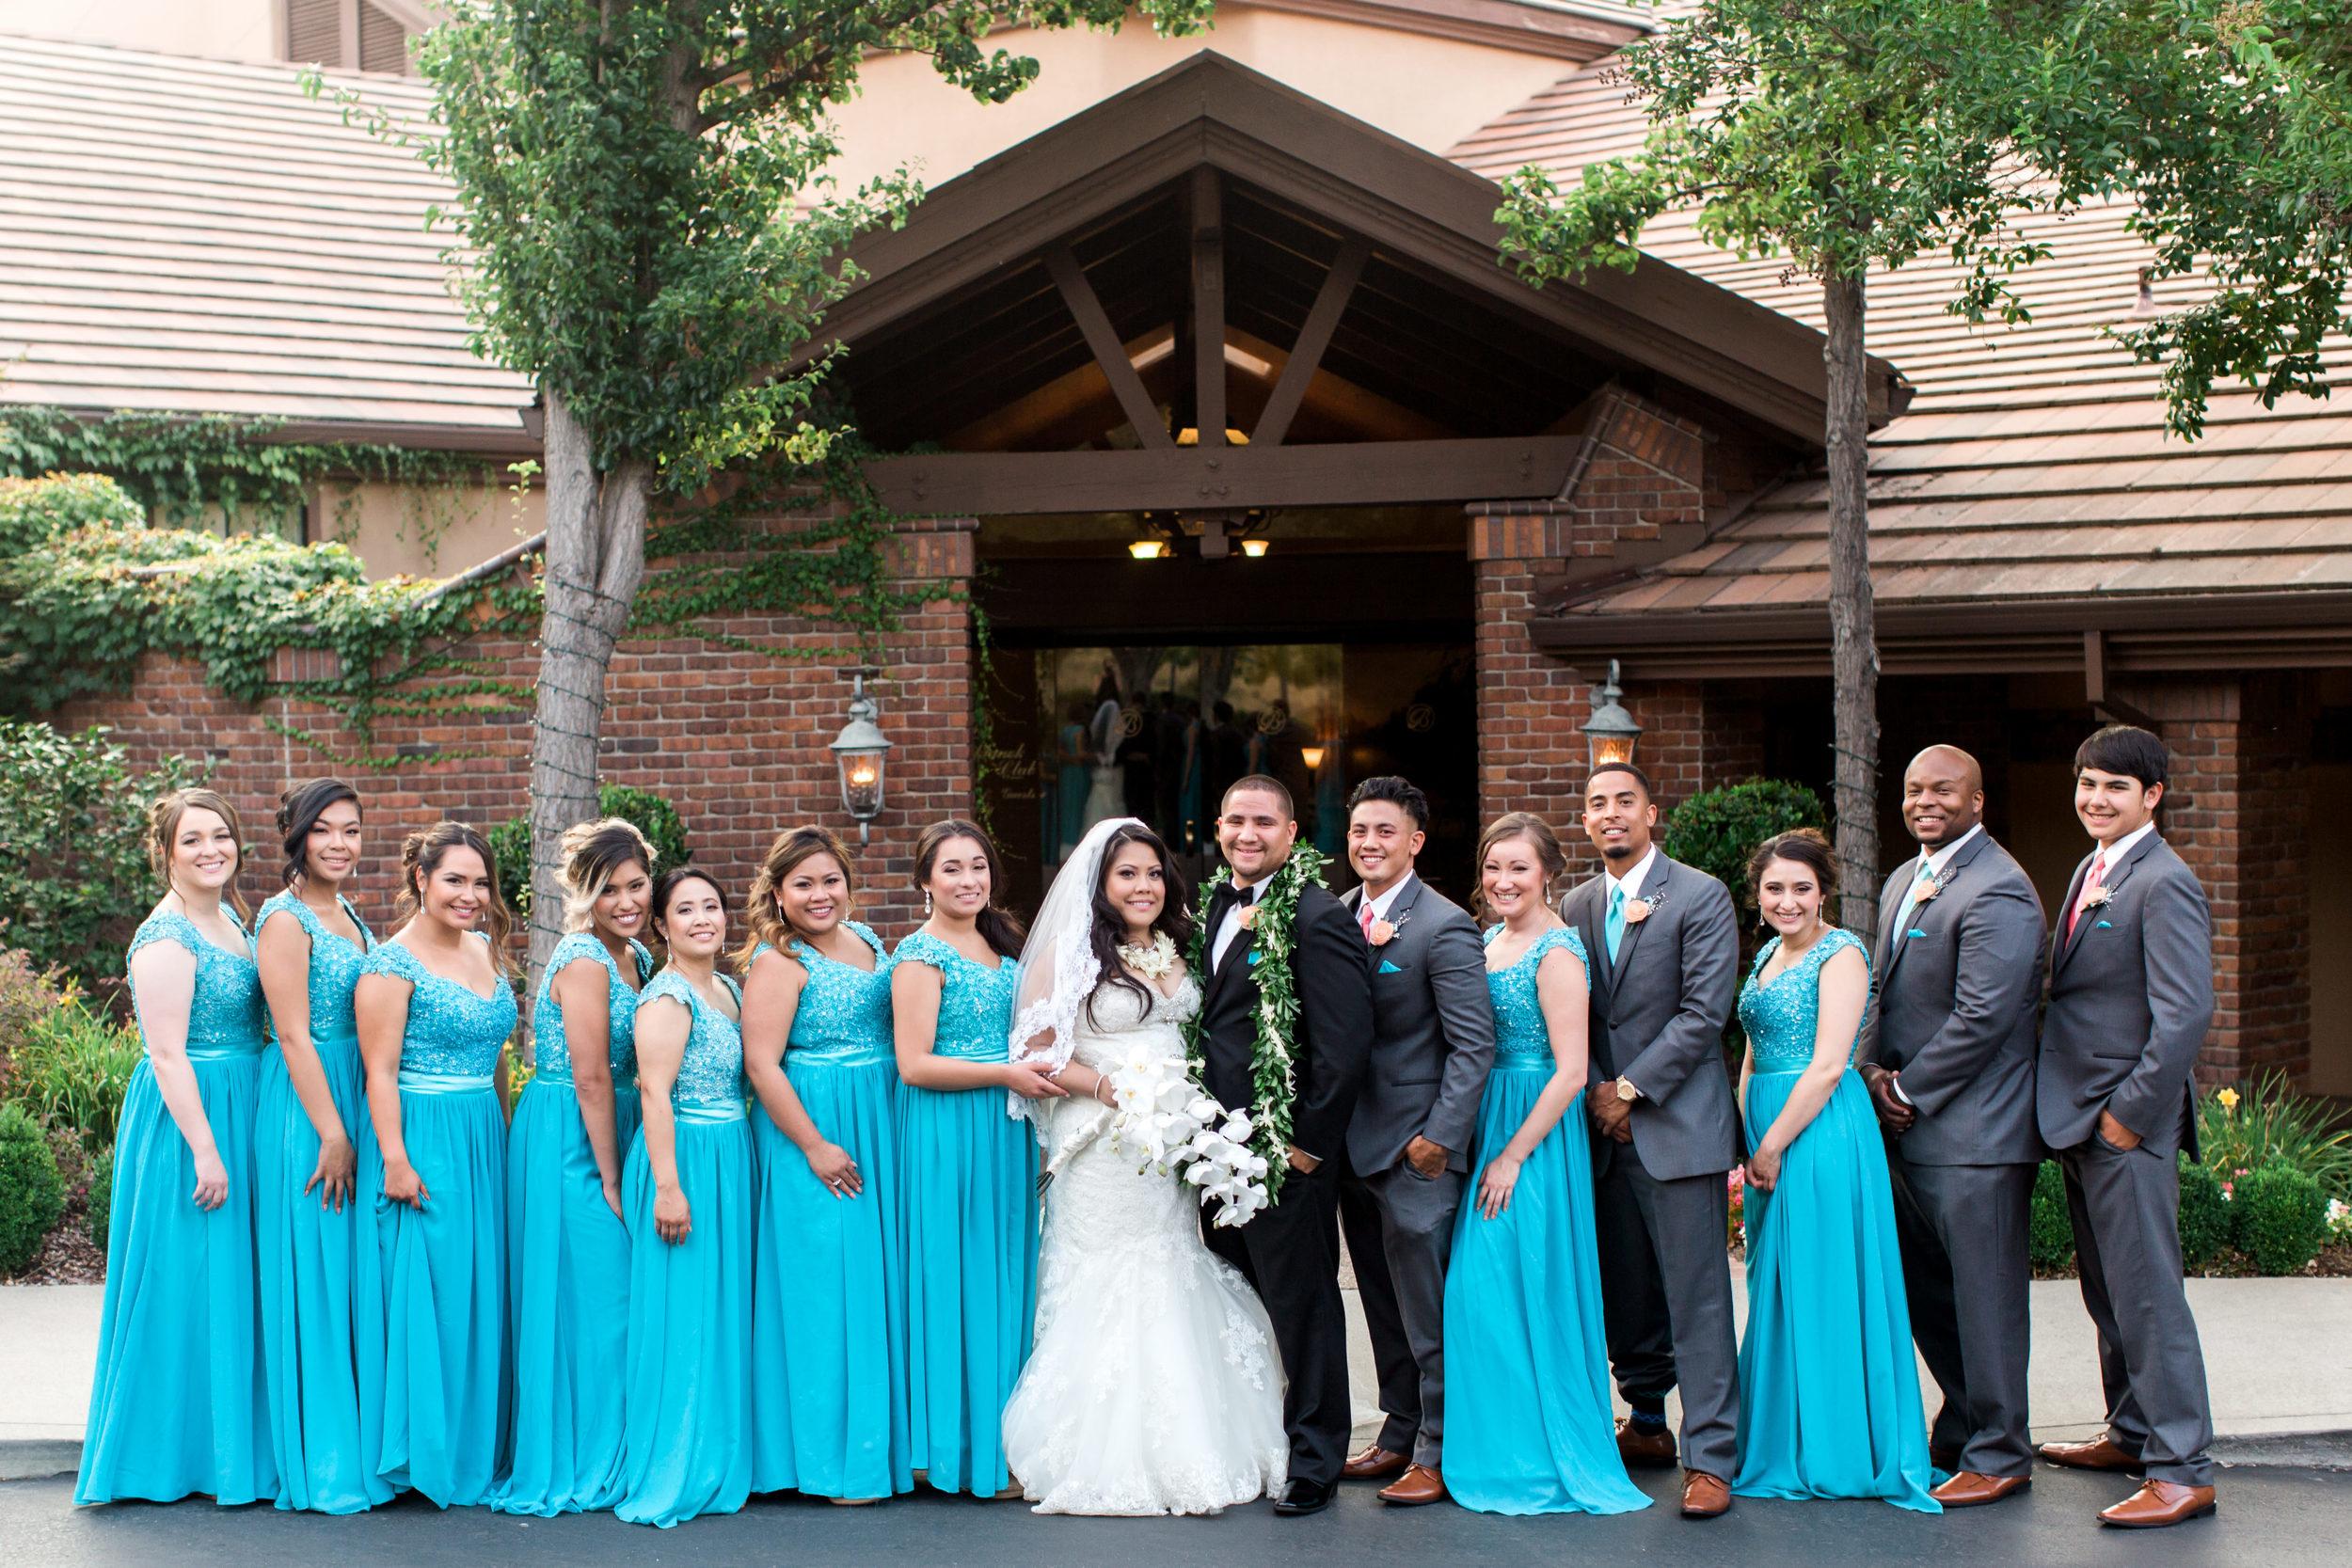 hawaiian-inspired-wedding-at-blackhawk-country-club-3279.jpg